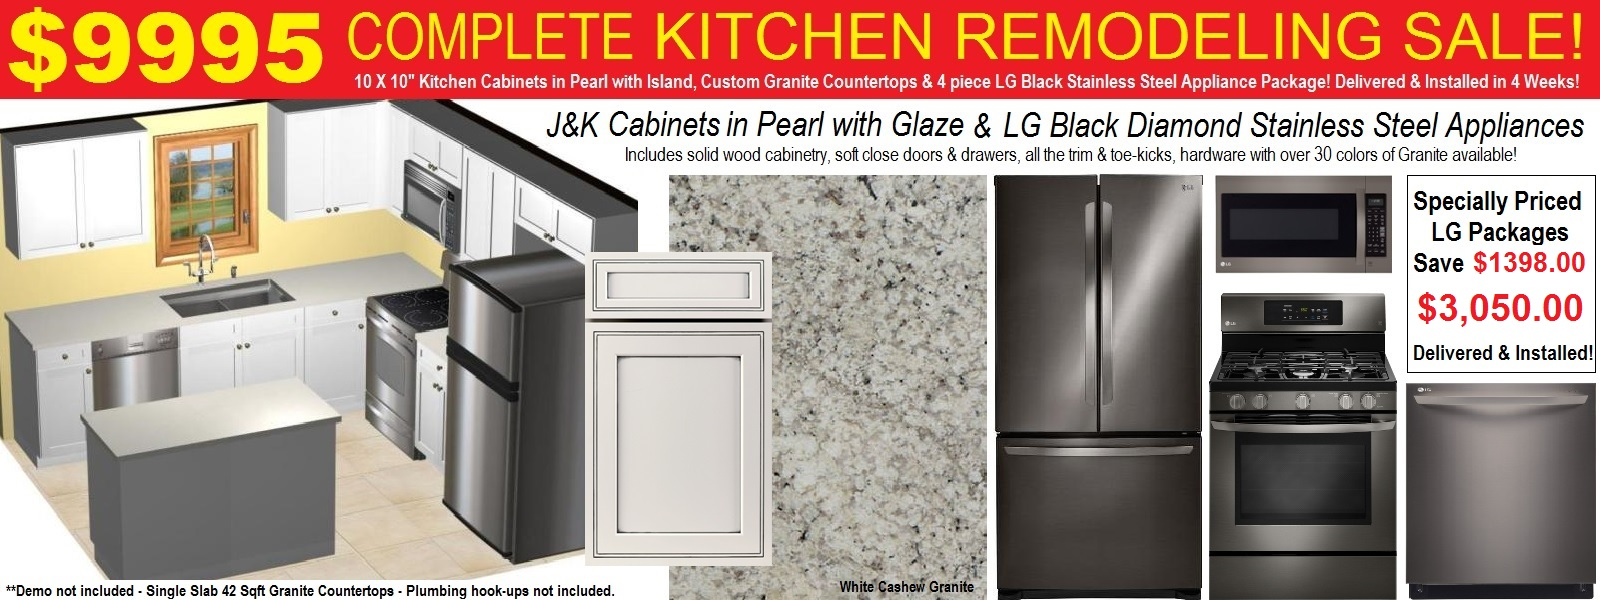 kitchenazcabinets kitchen remodeling phoenix az Kitchen Cabinets Countertops Glendale AZ